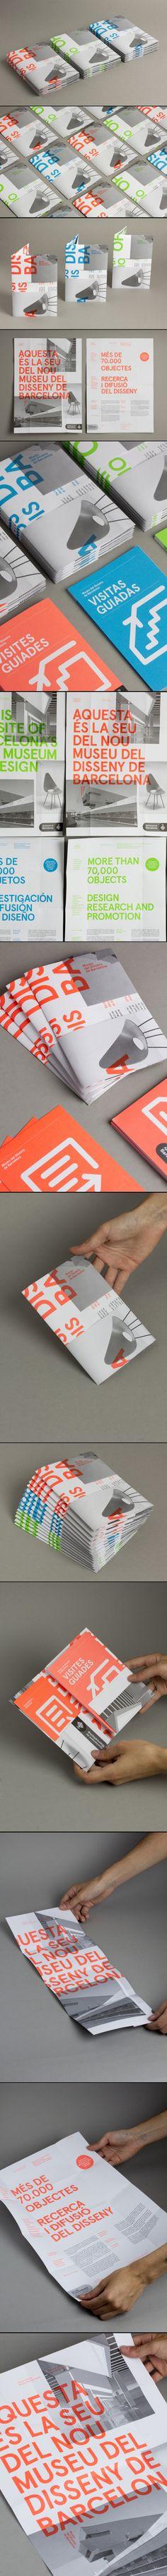 DHUB Leaflet - Print, Identity - 06/2013 - created via http://pinthemall.net